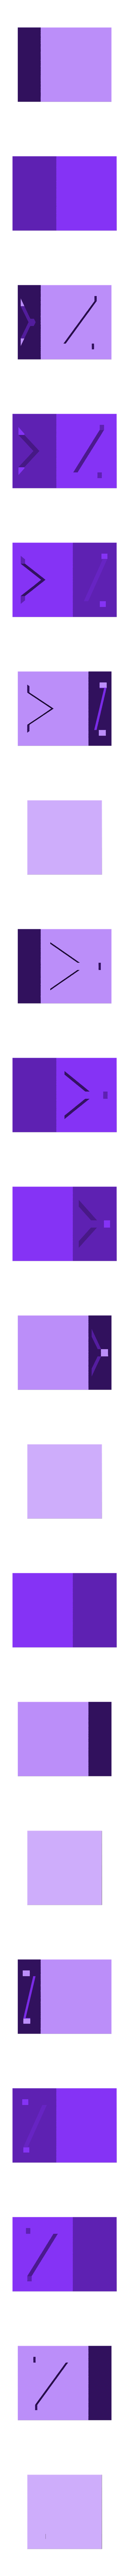 xyzHollowCalibrationCube.stl Download free STL file XYZ 20mm Hollow Calibration Cube (Single Color / Dual Color) • 3D printer model, spiritdude